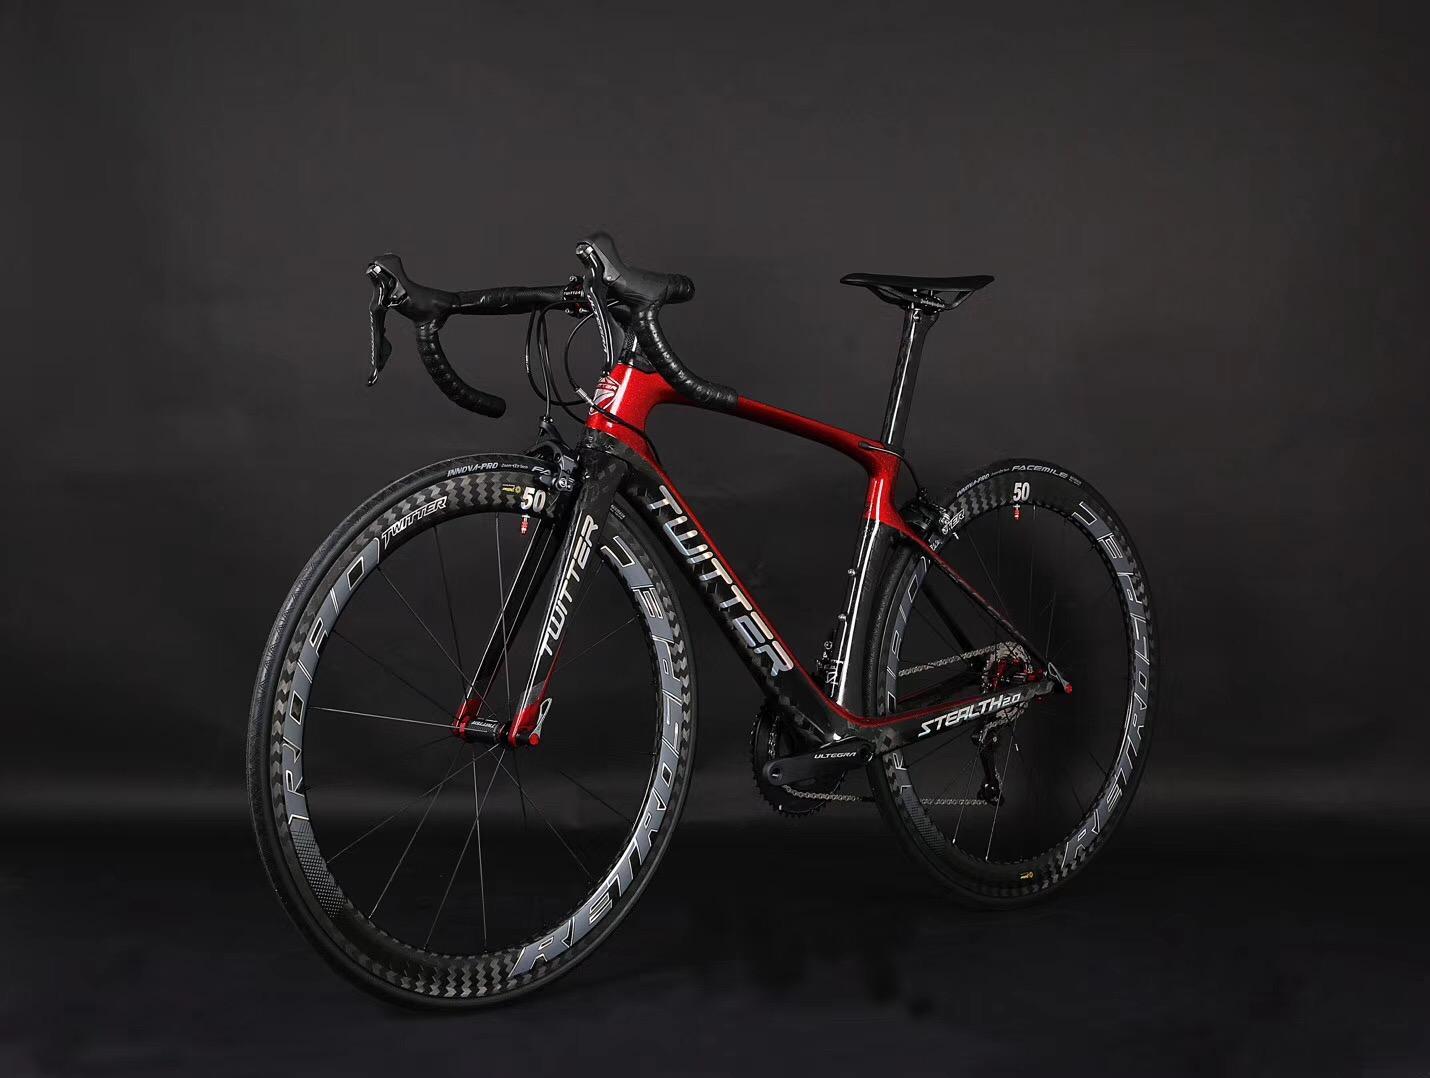 TWITTER carbon road bike STEALTH2.0 Bike factory OEM ODM bike 2